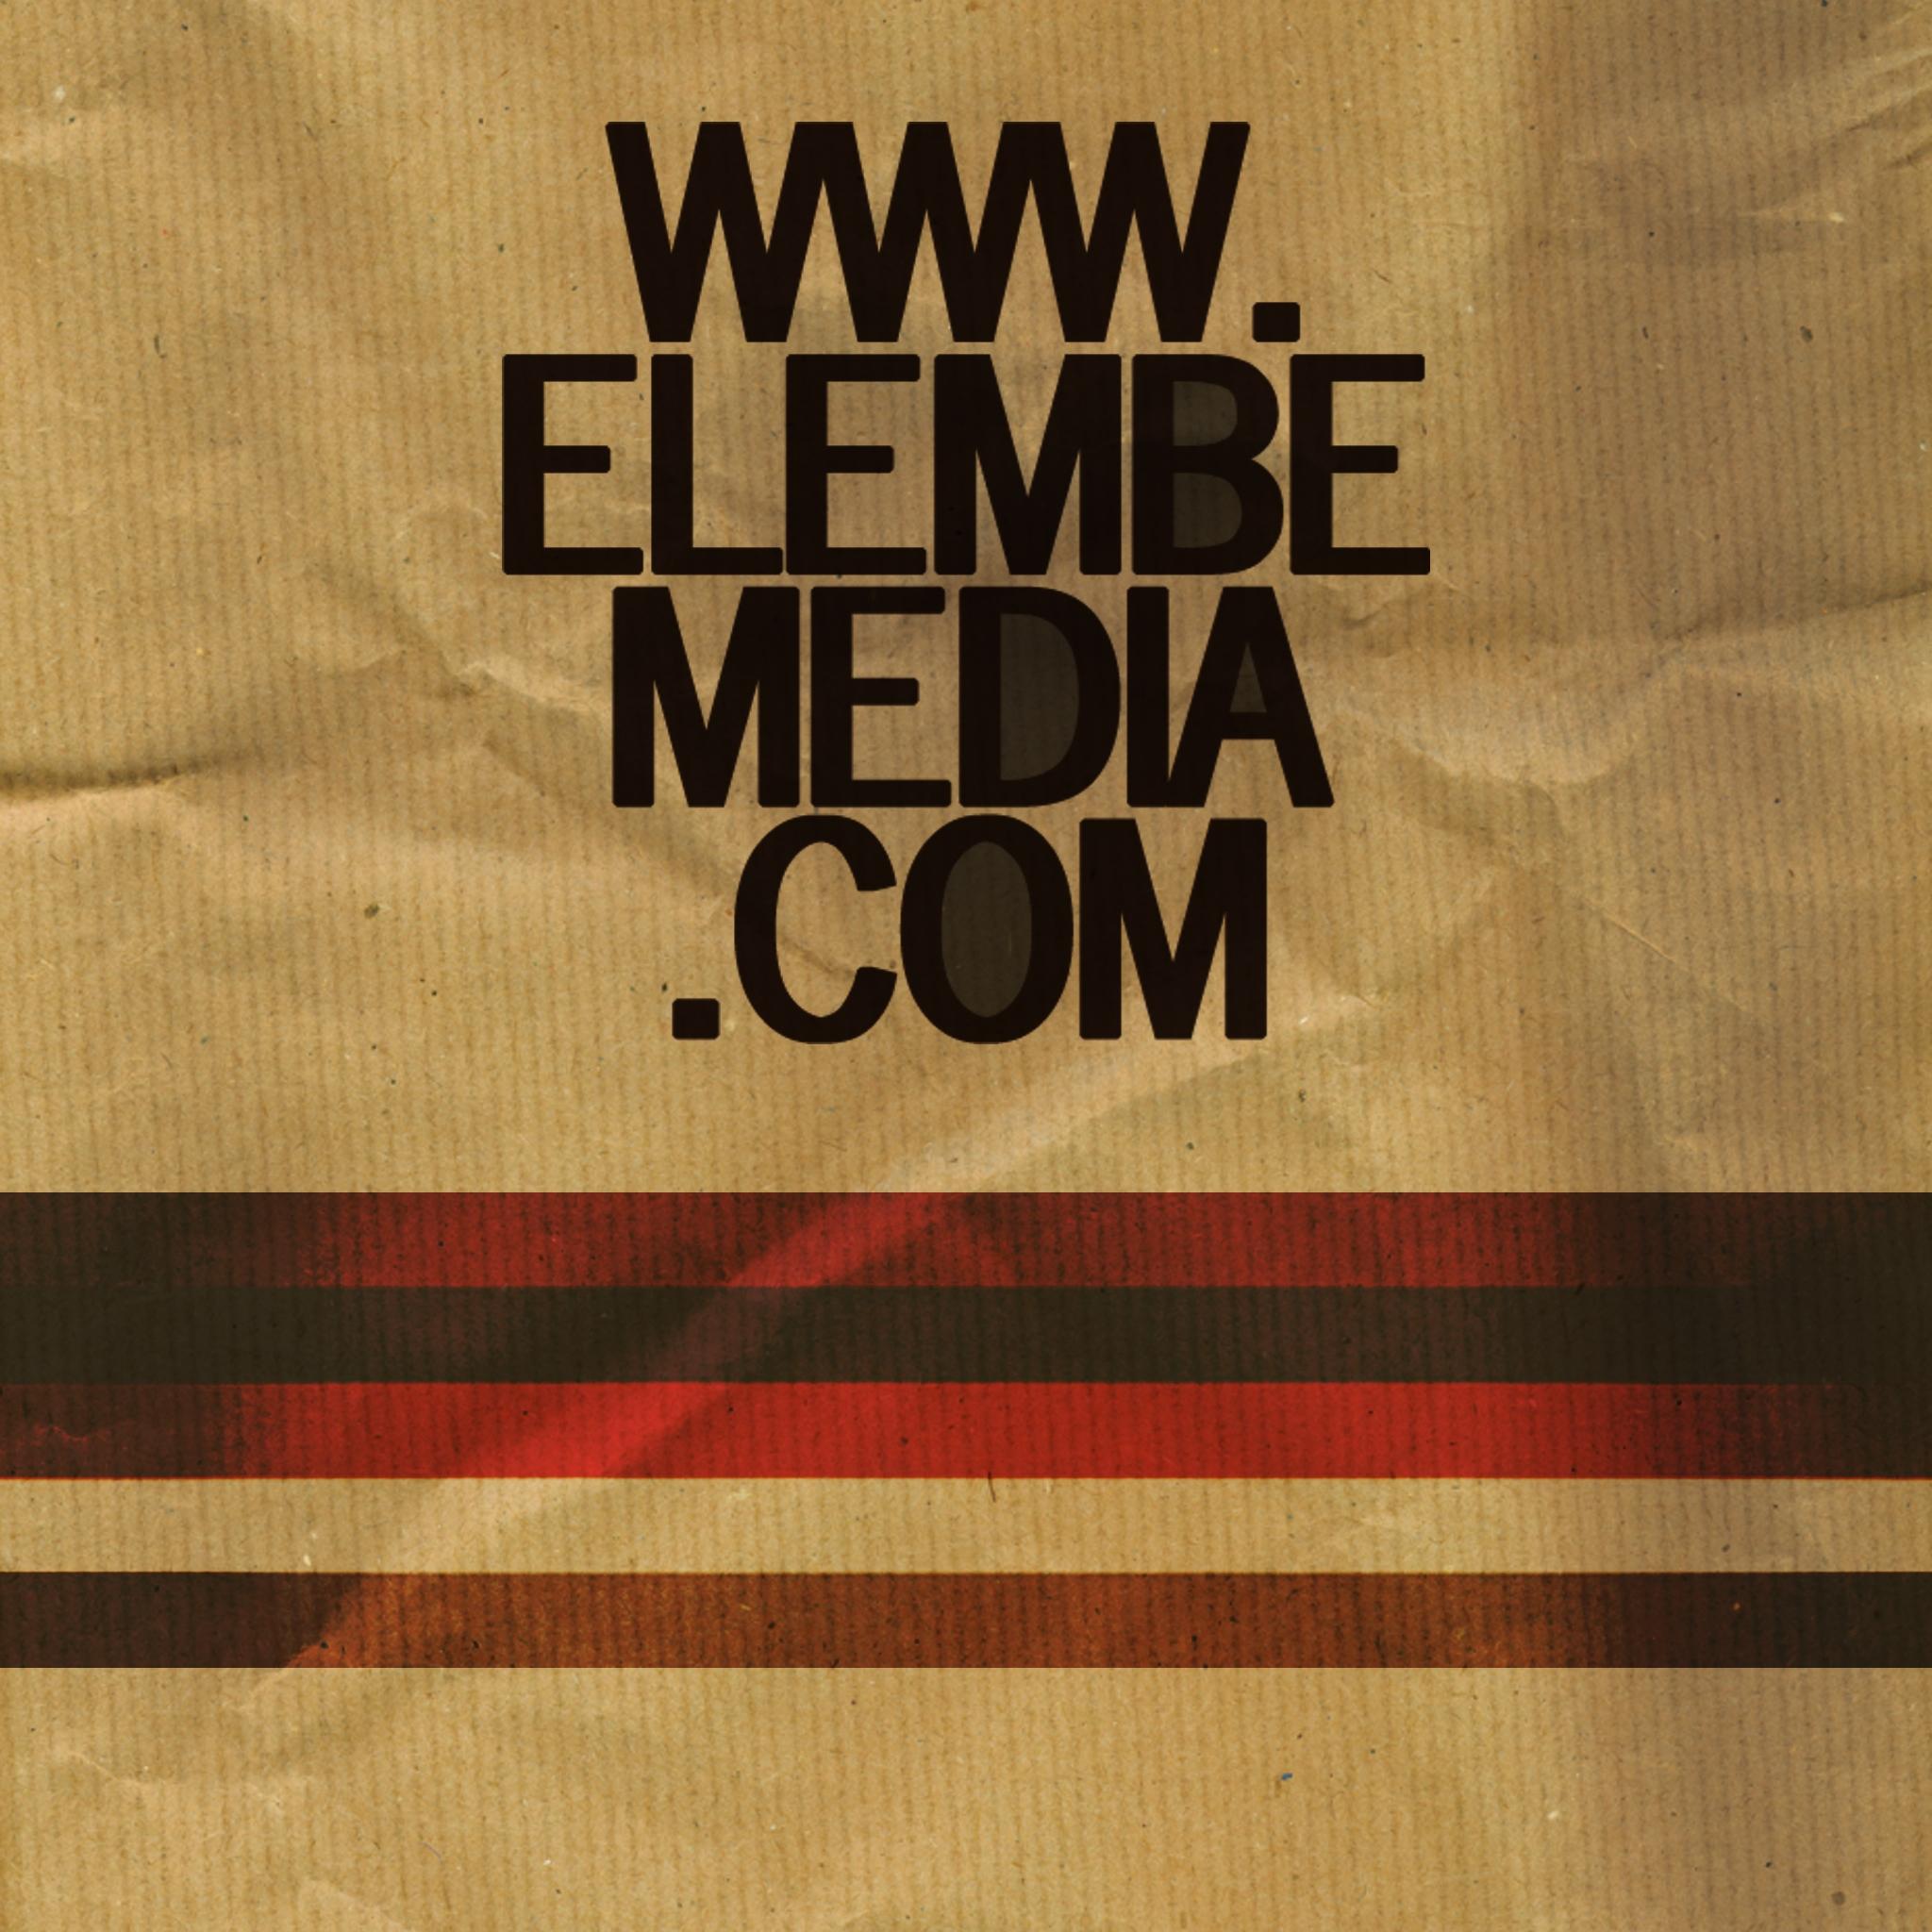 The Elembe Podcast